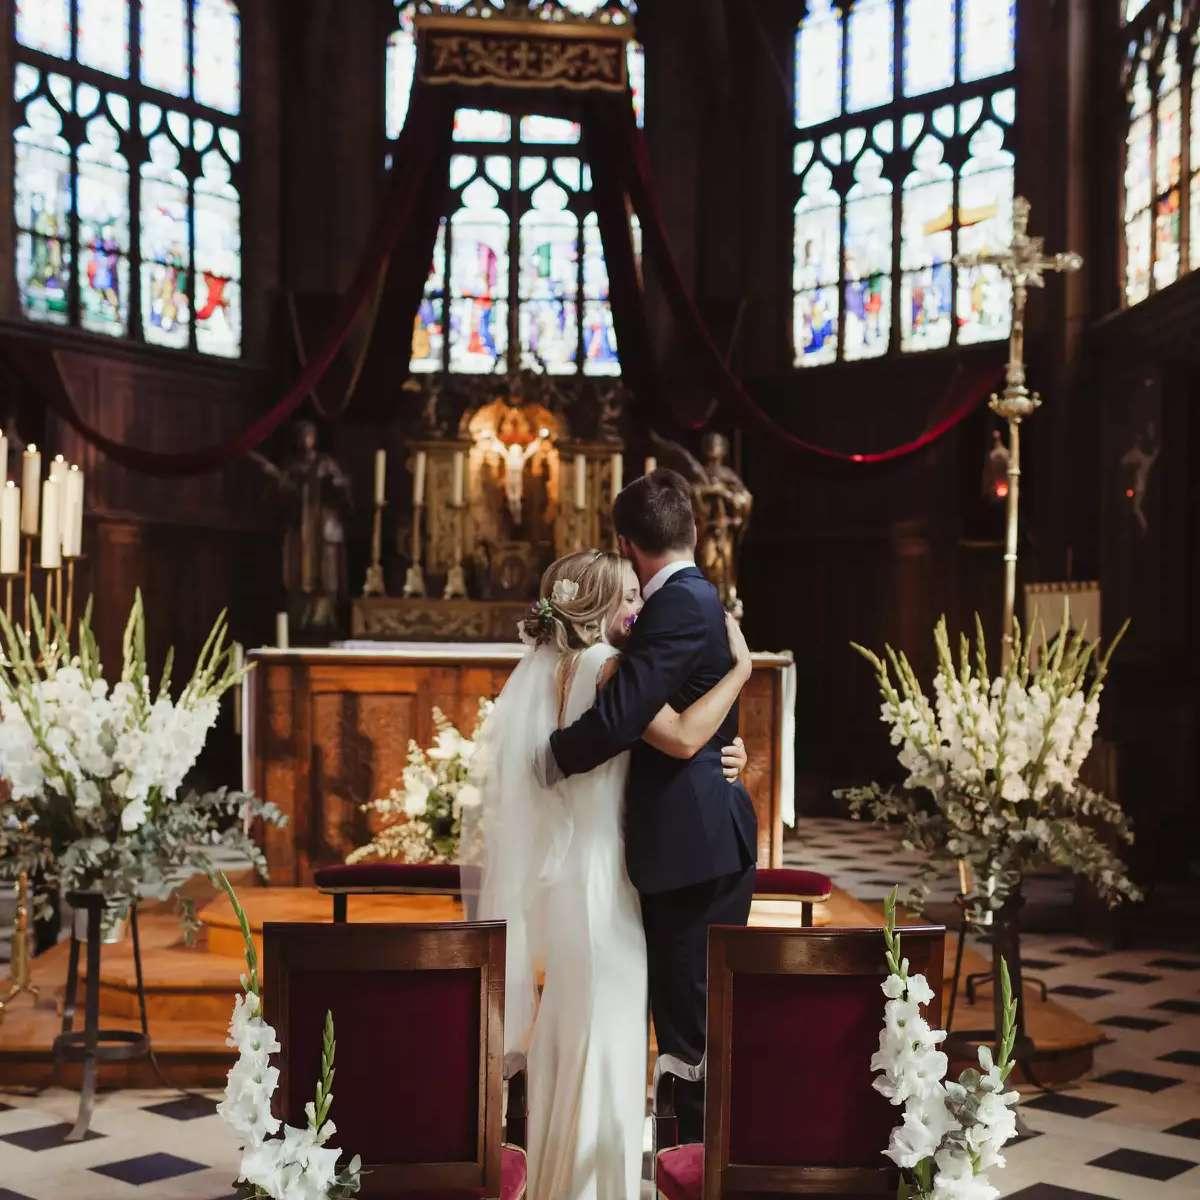 Church wedding with long stem flowers